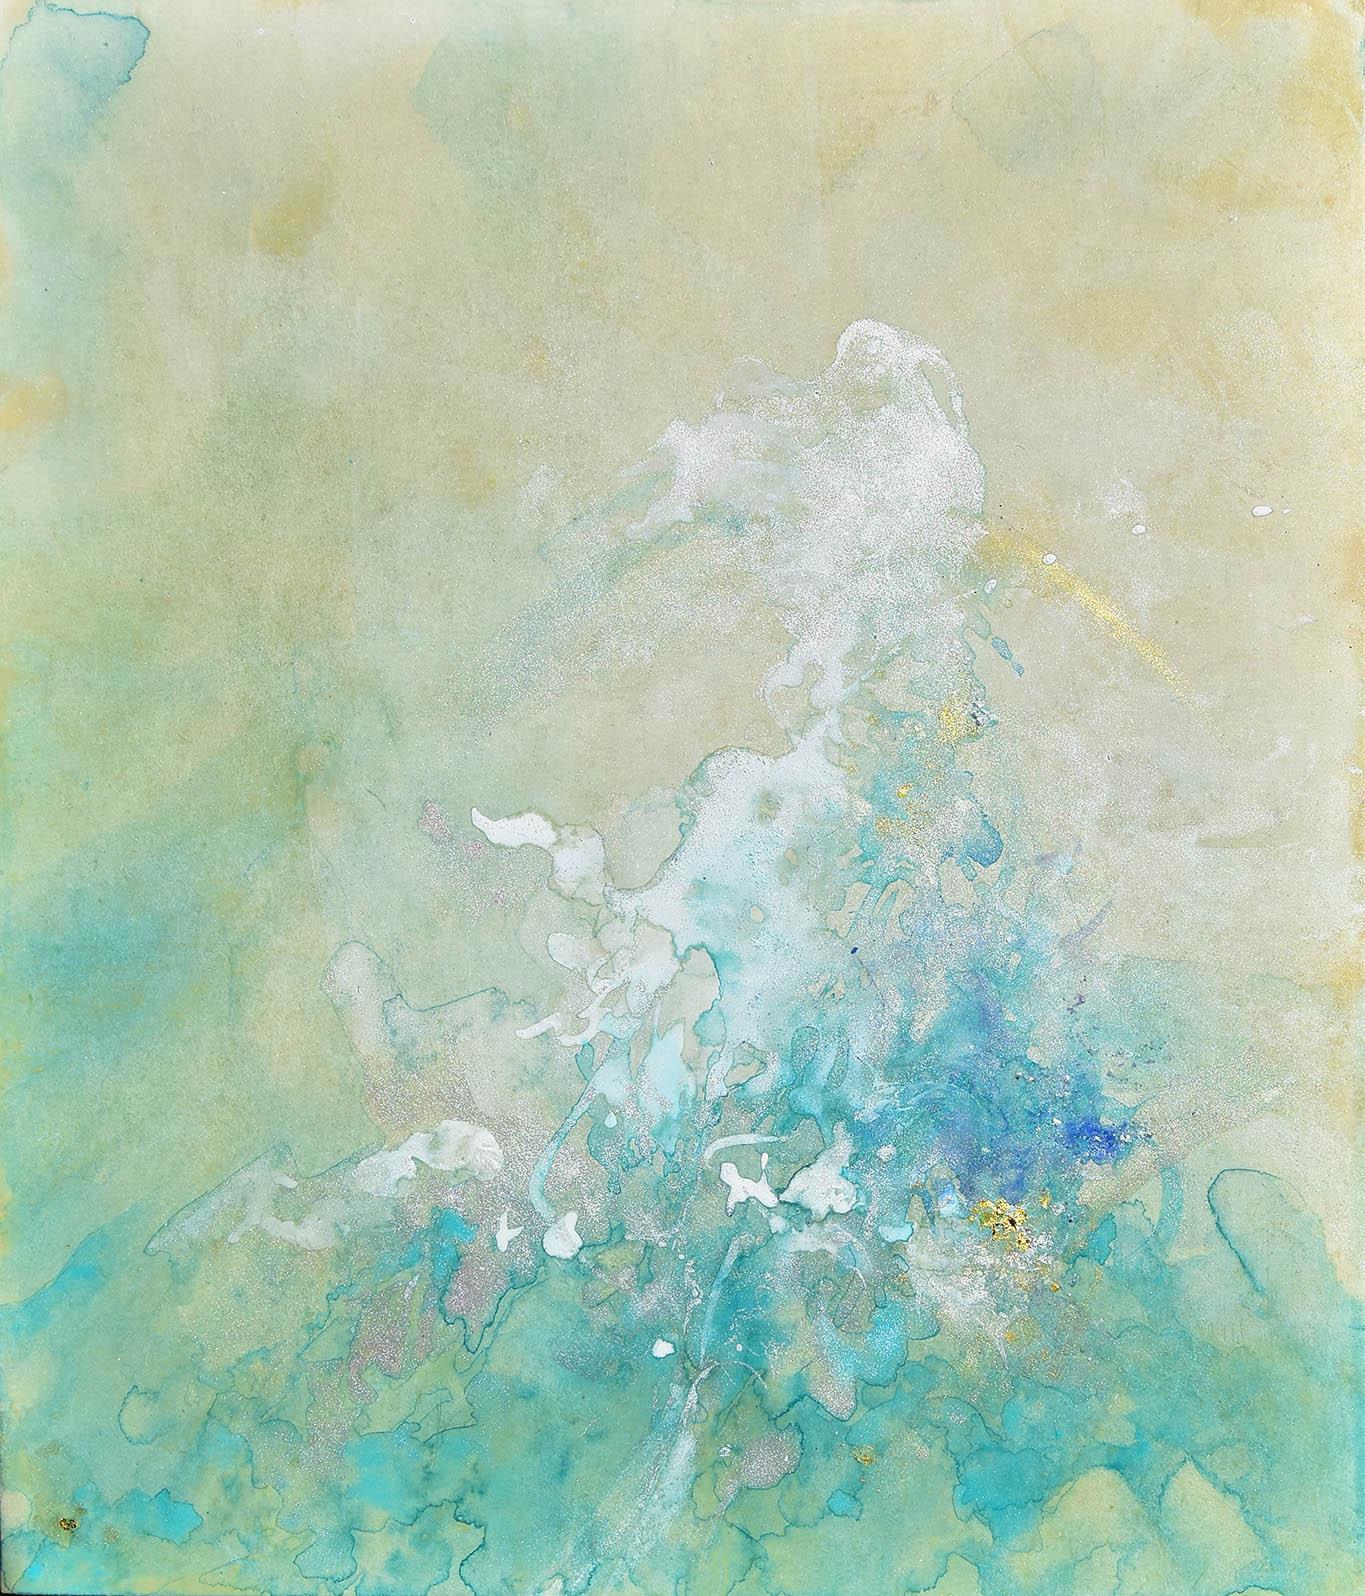 LIFE LVI (56) - BLUE